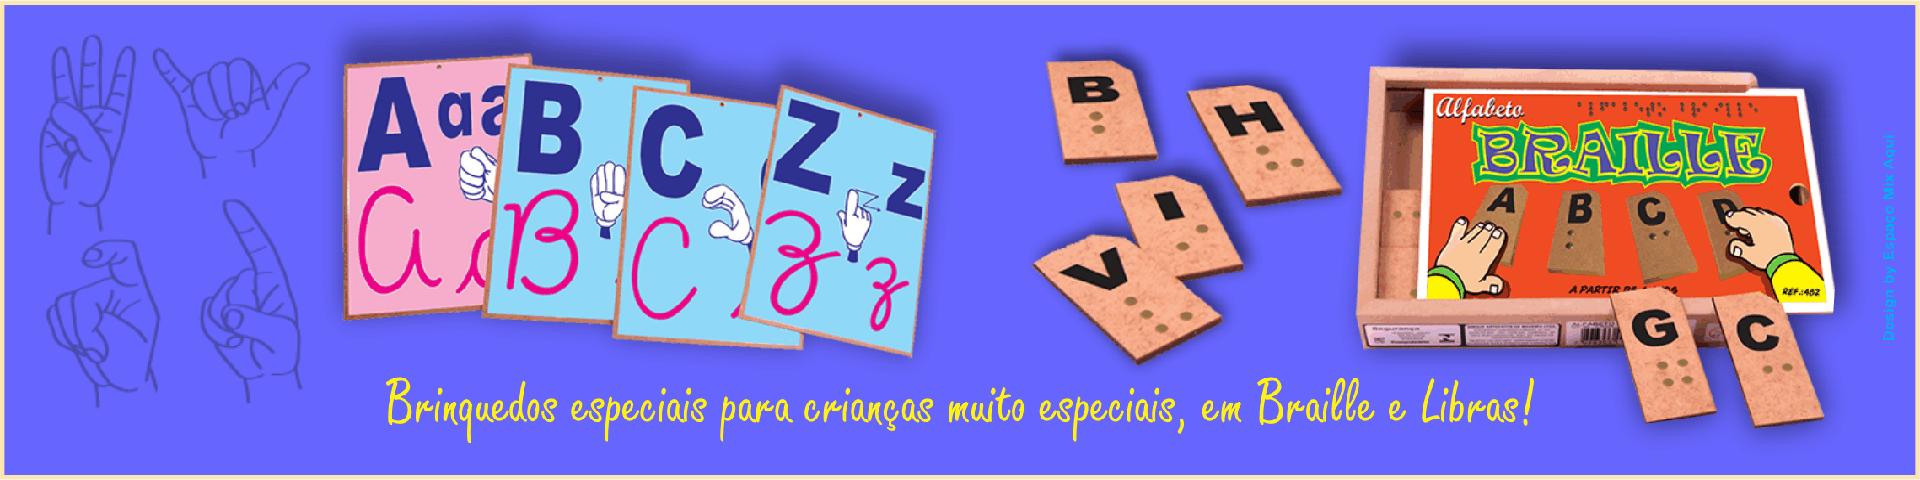 Braille e Libras